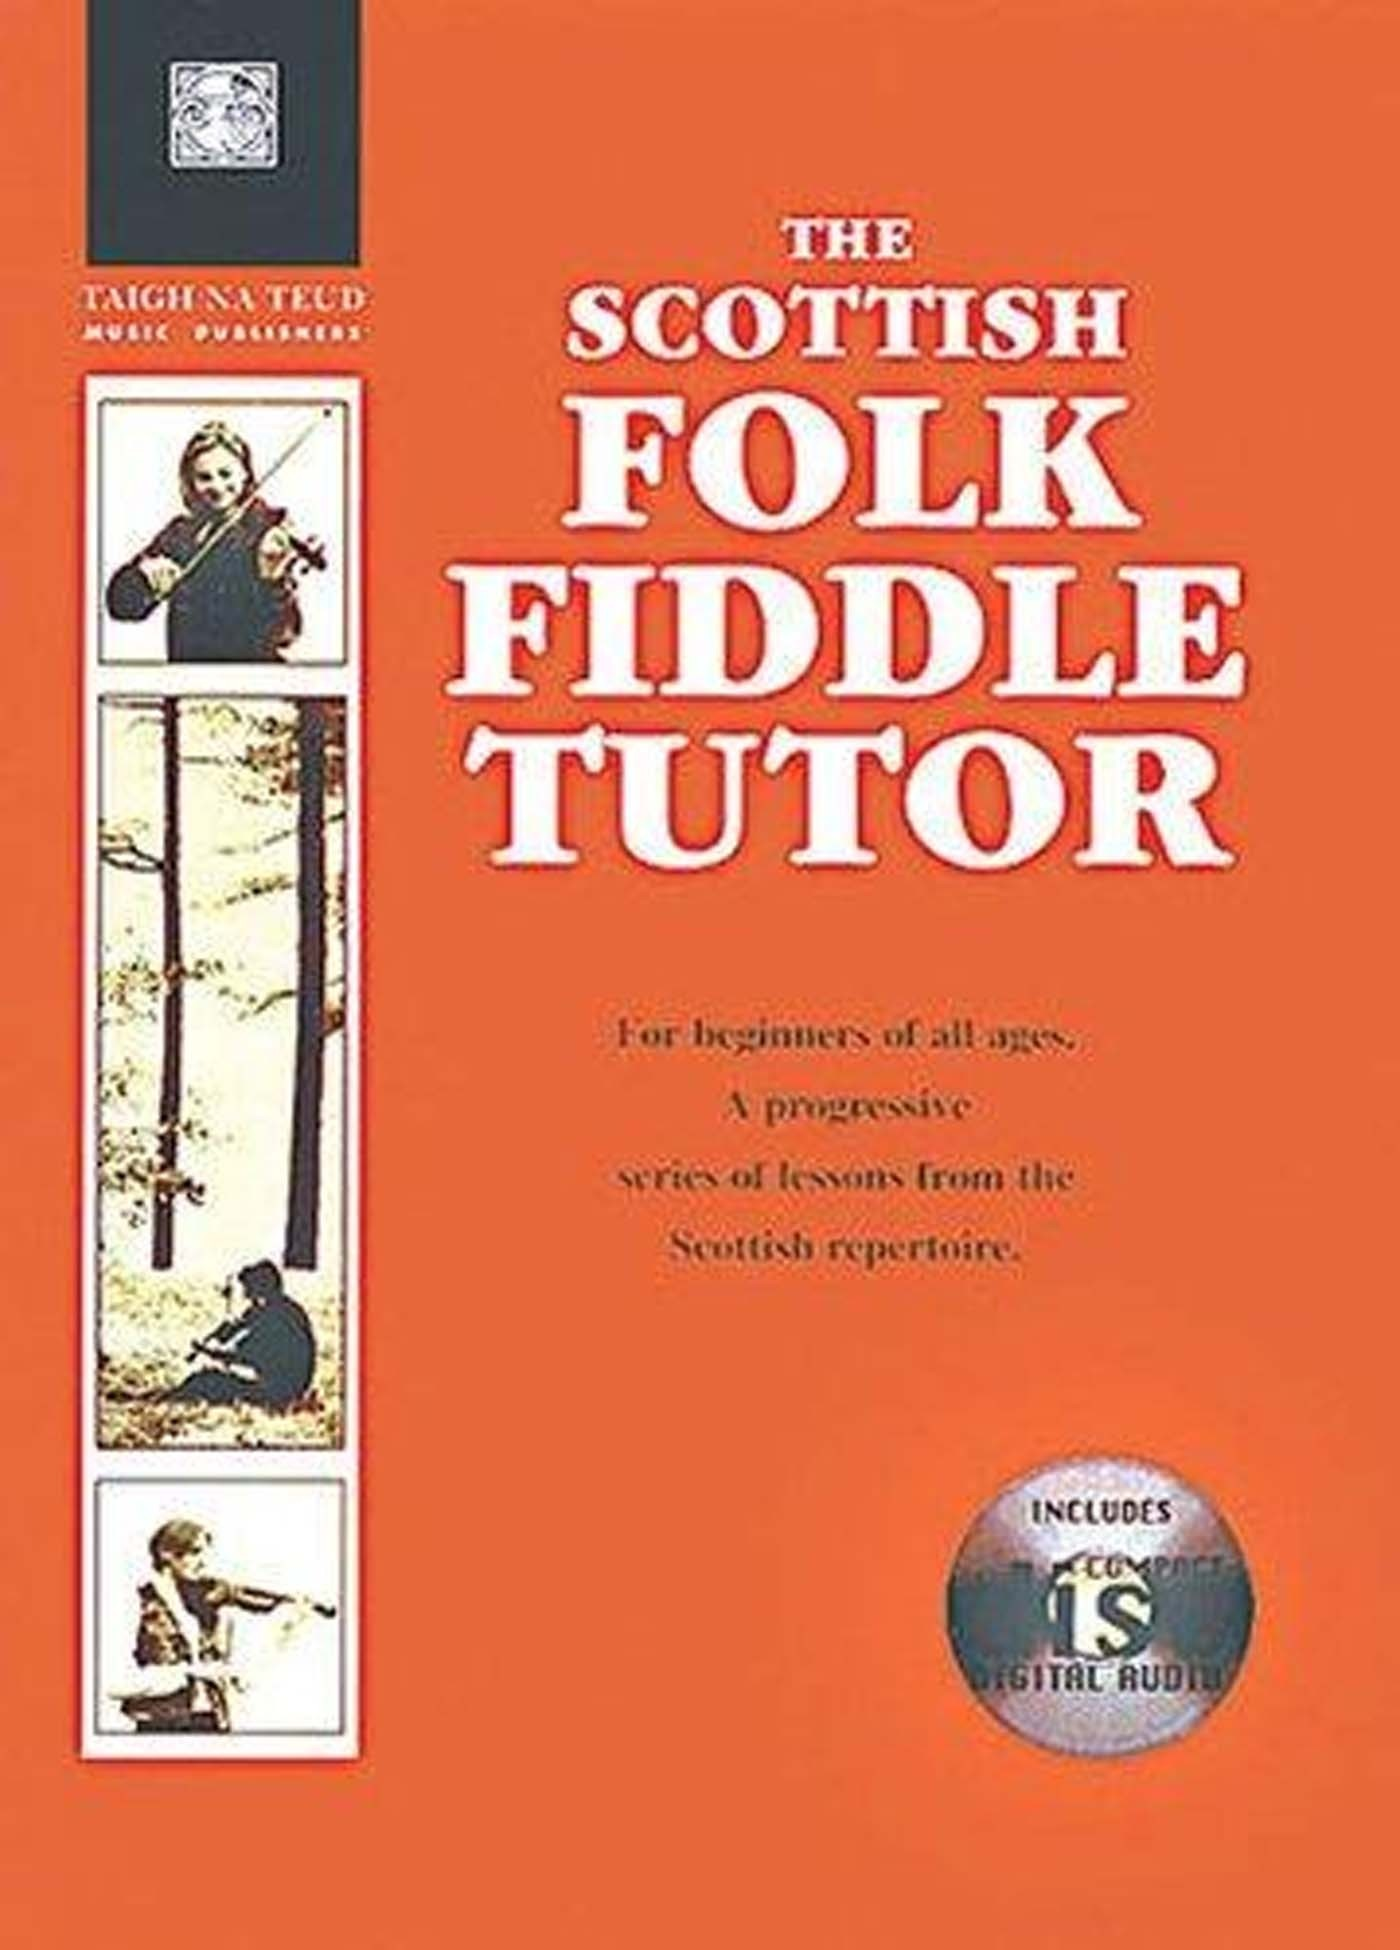 The Scottish Folk Fiddle Tutor Book Violin Beginner Progressive Lessons S147